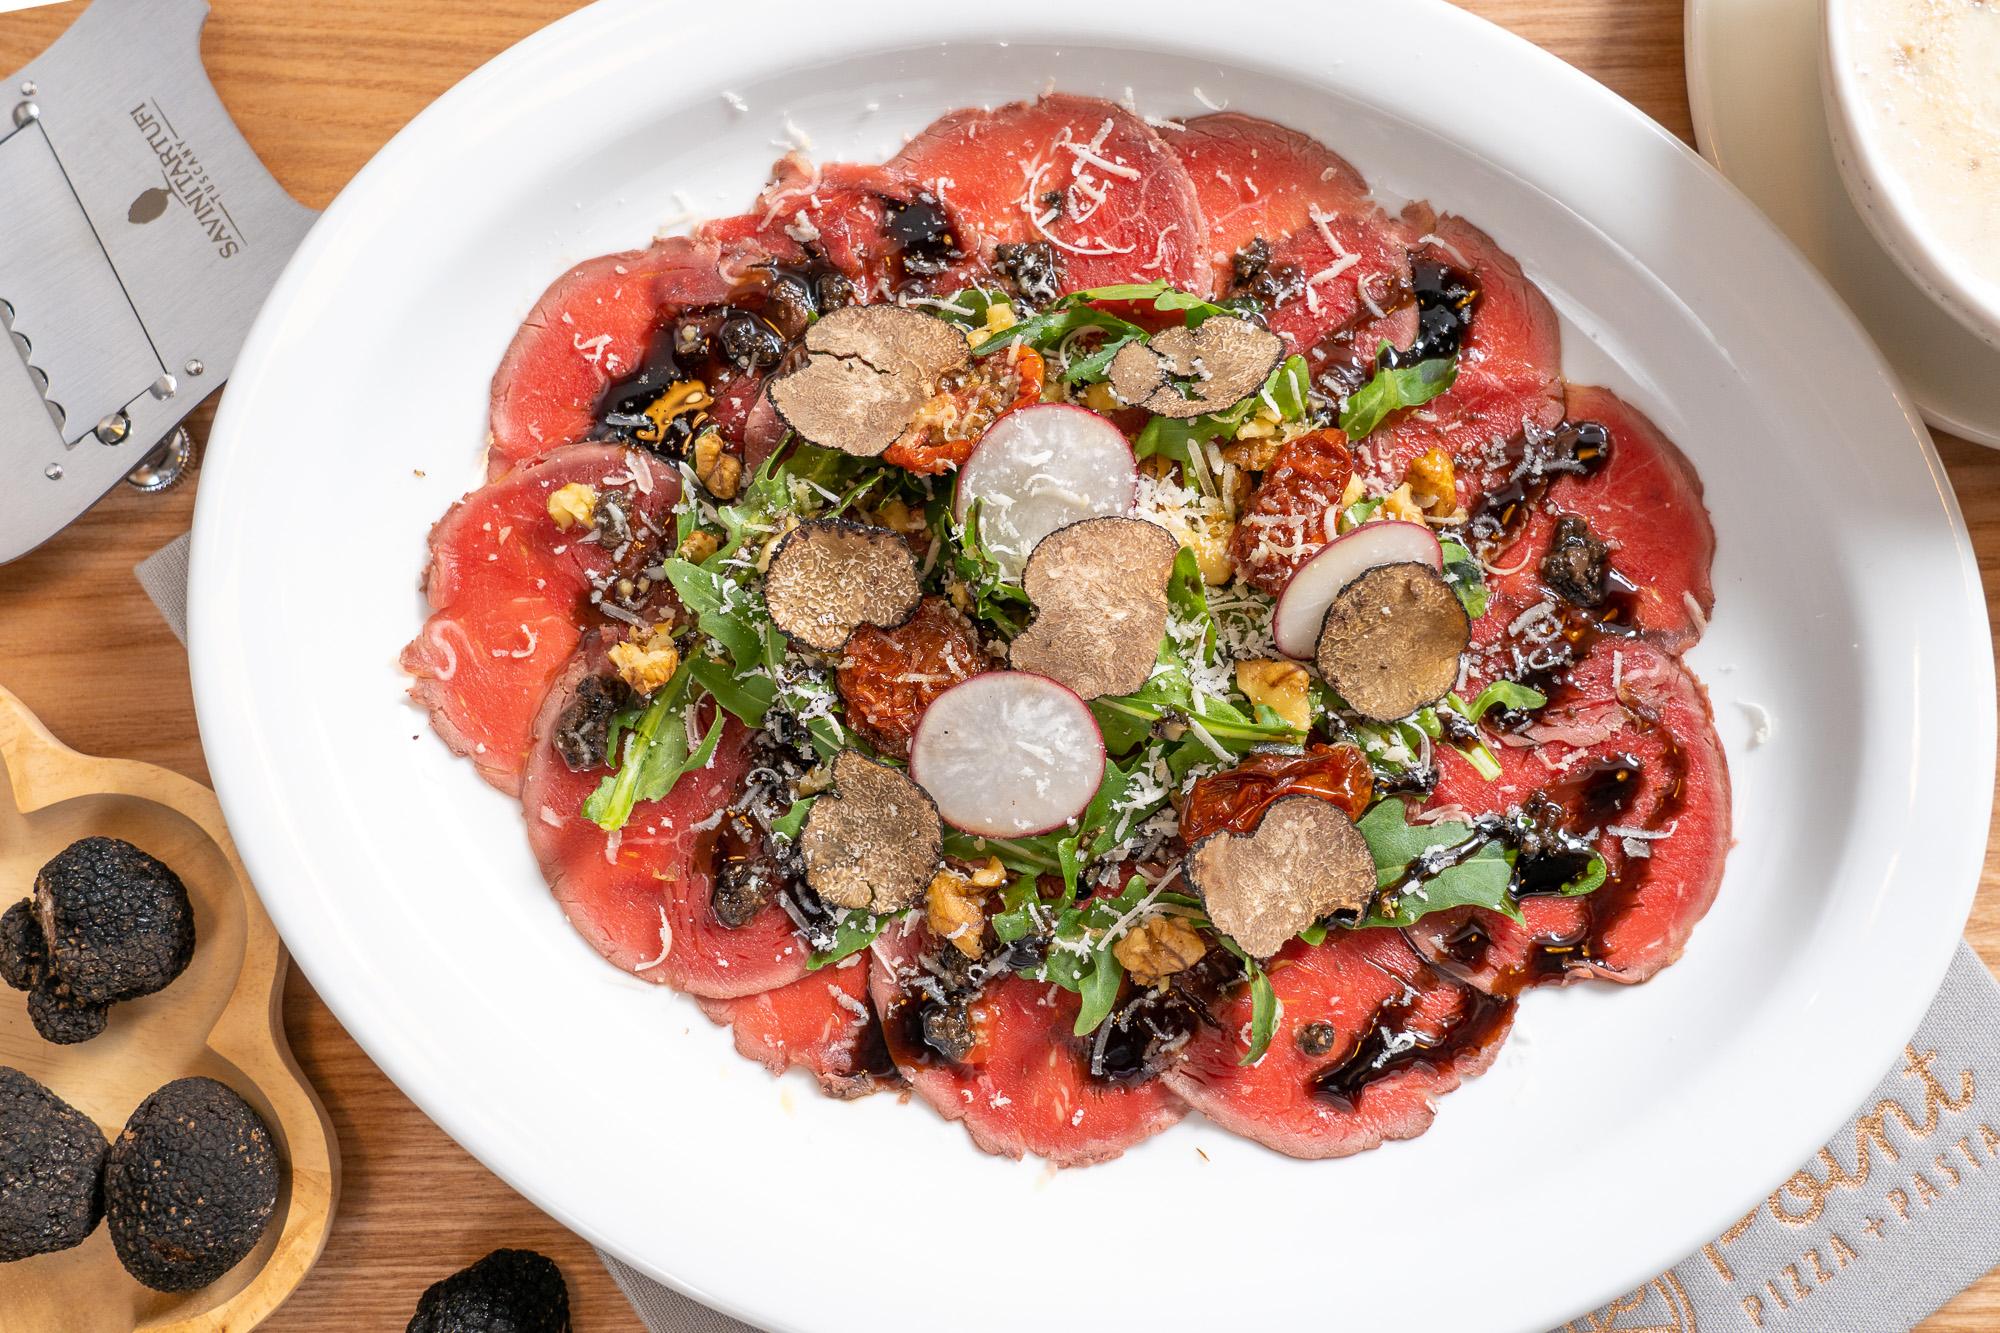 Beef Carpaccio with Black Truffle and Arugula Salad